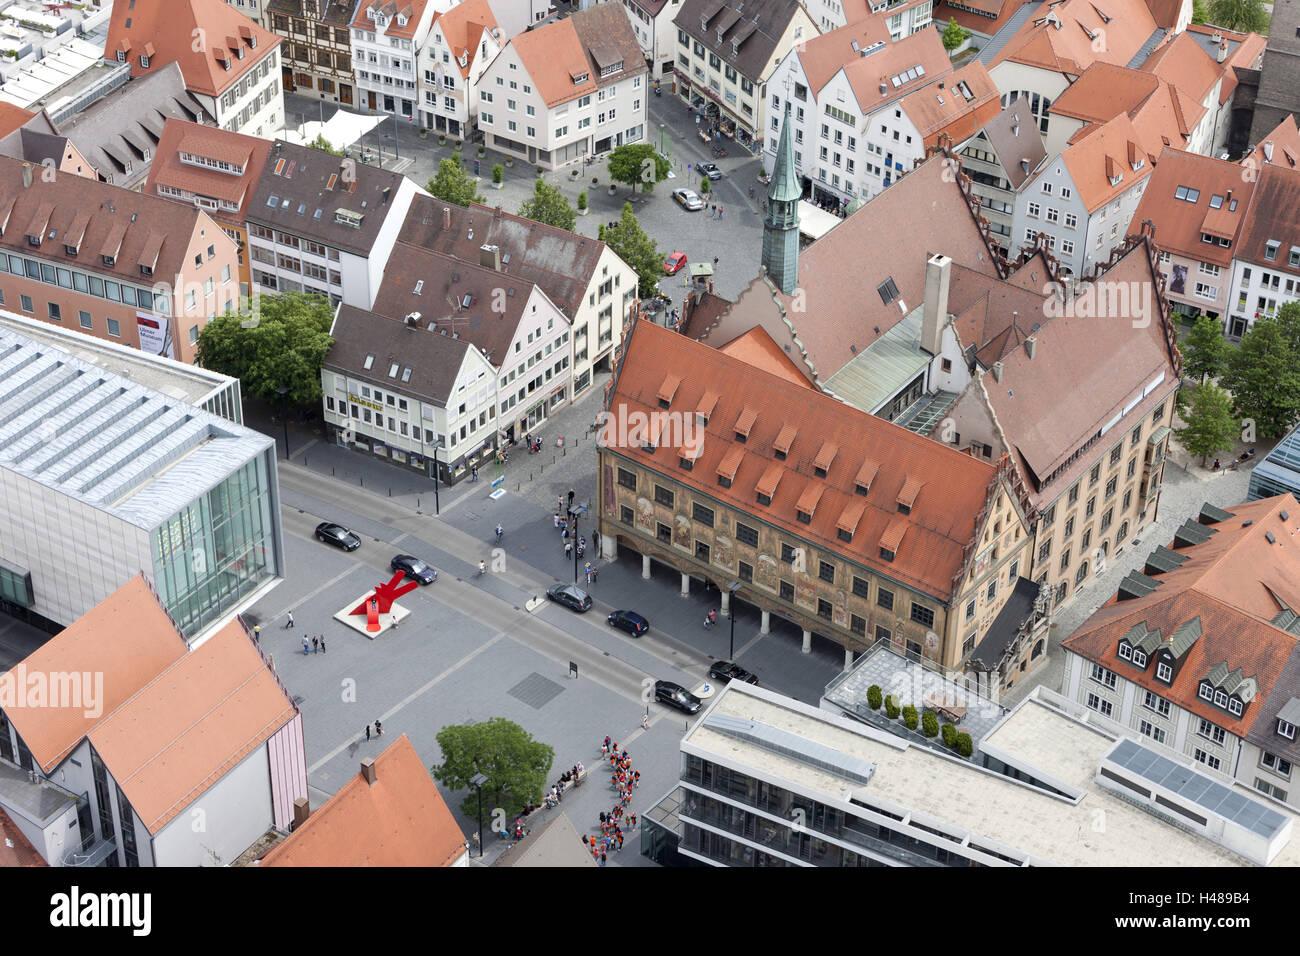 Germany, Baden-Württemberg, Ulm, view of Ulm Minster, Stock Photo